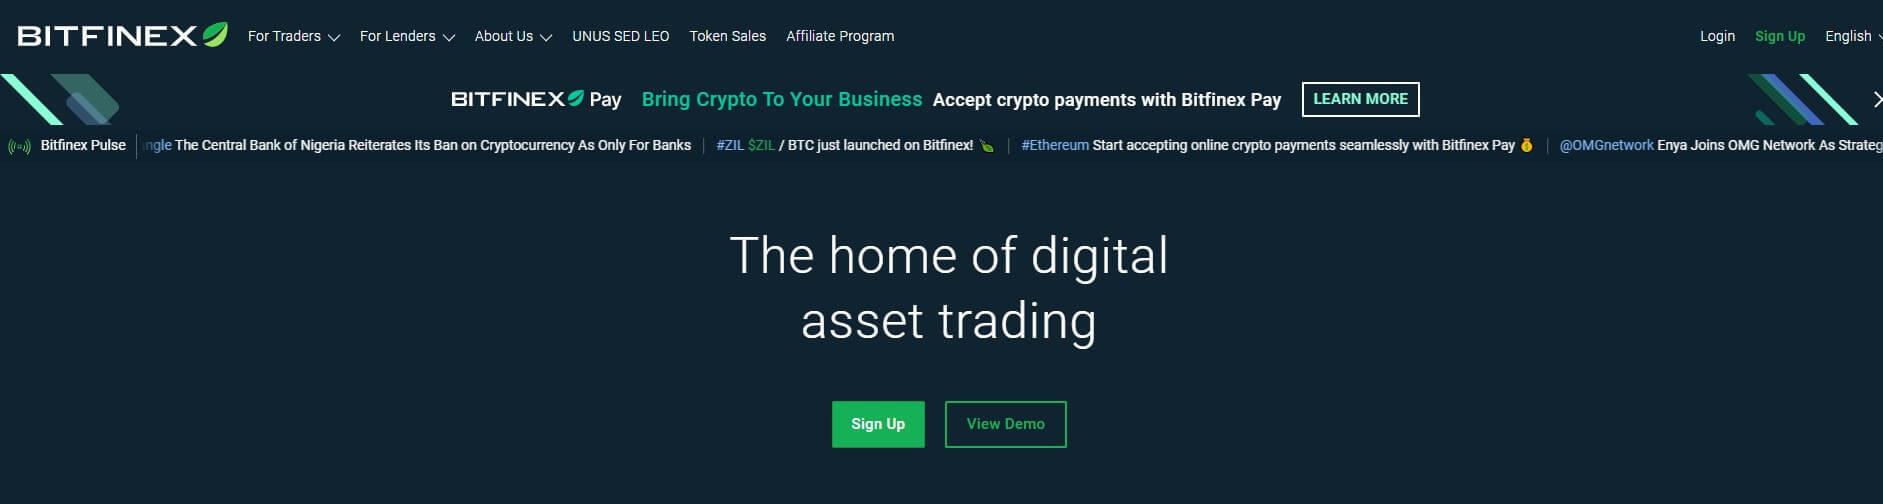 bitfinex-homepage